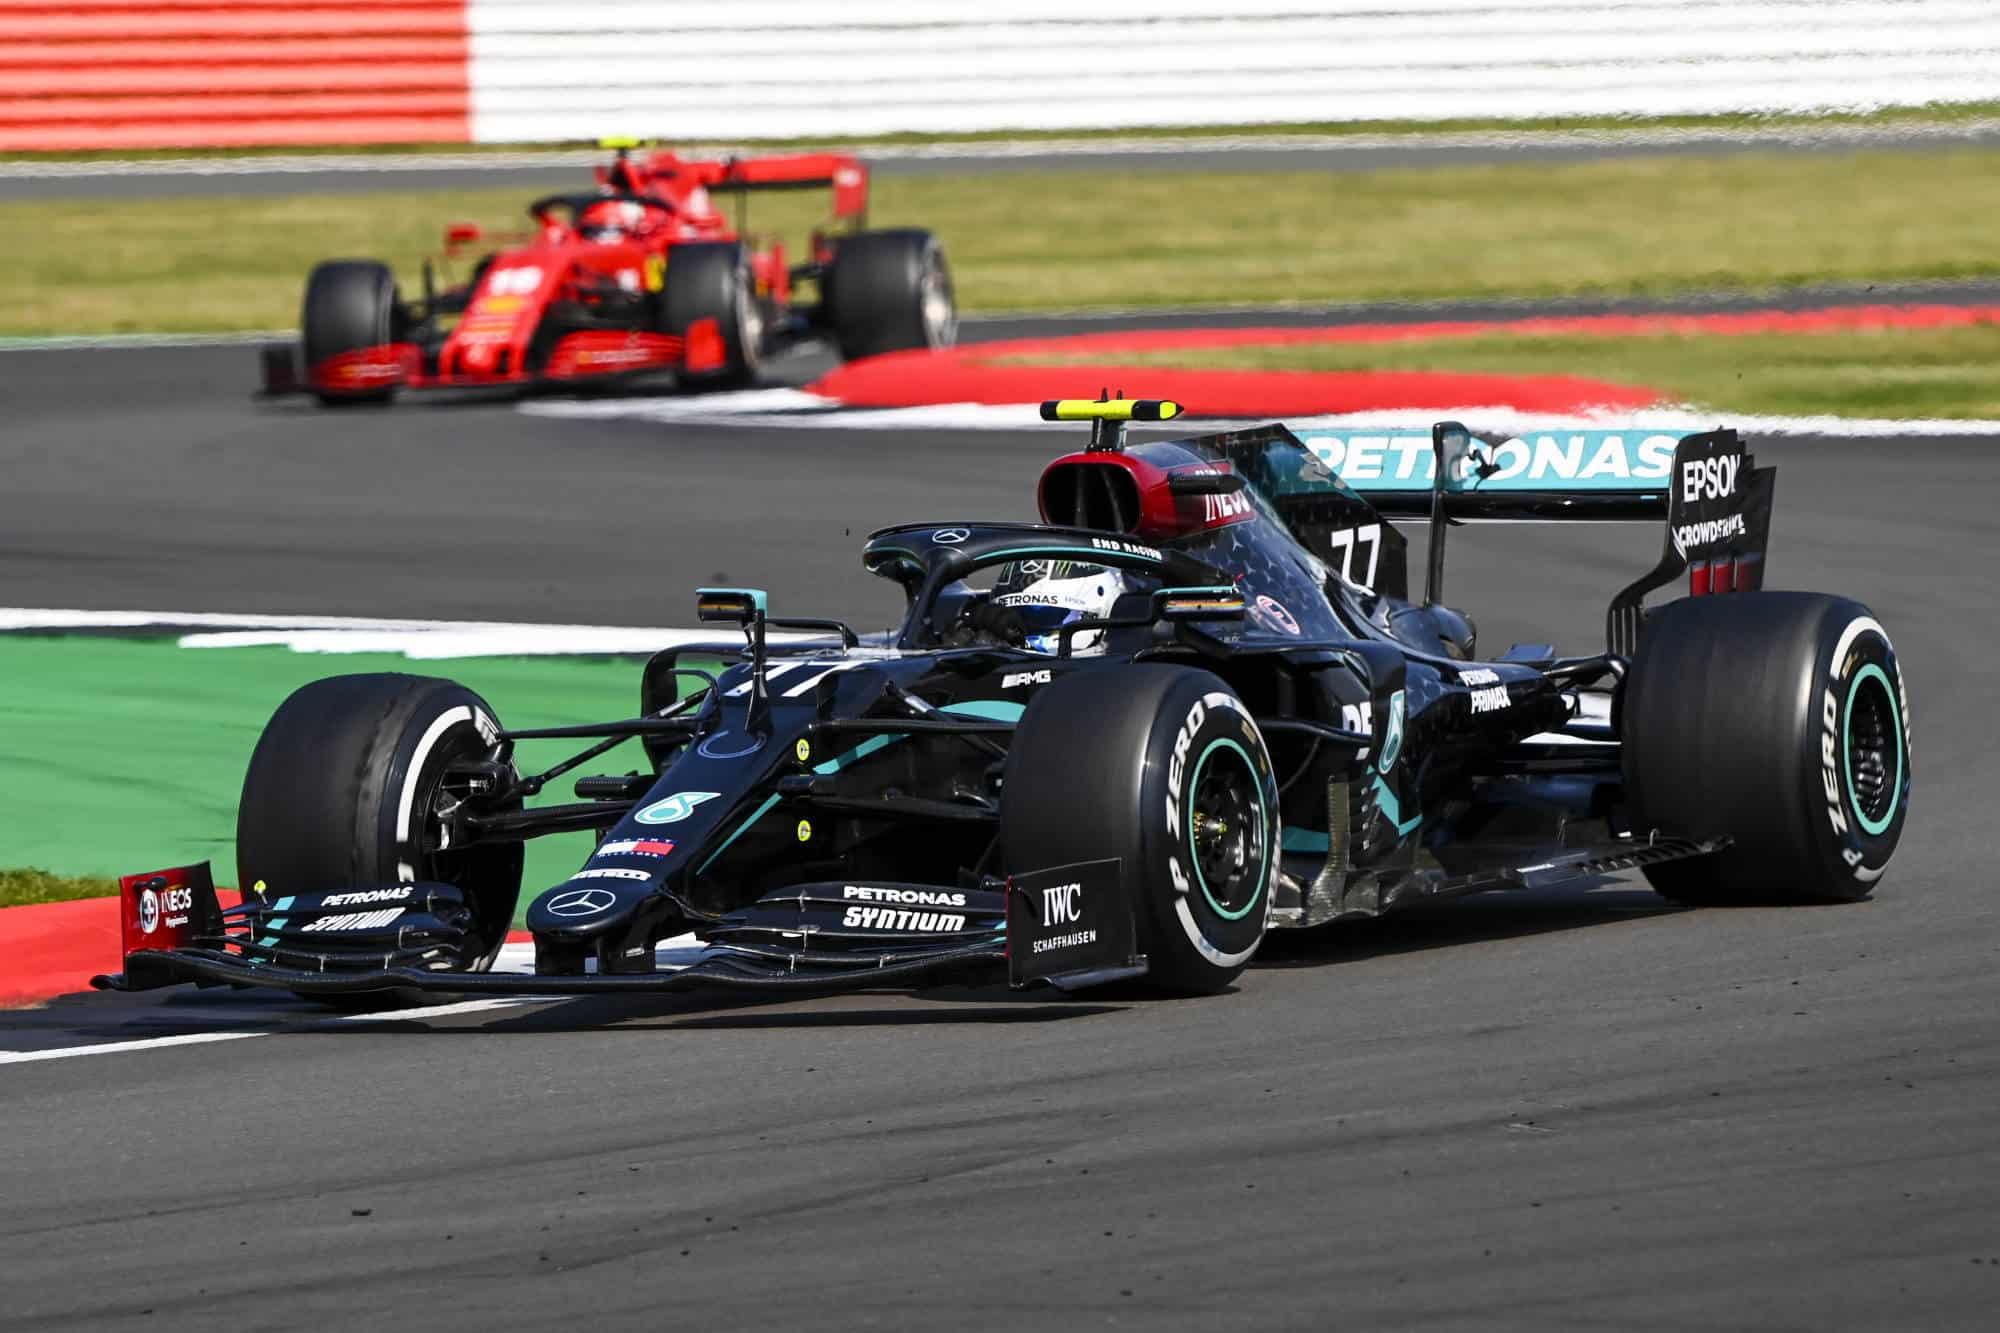 2020 British GP Bottas leads Leclerc Photo Daimler